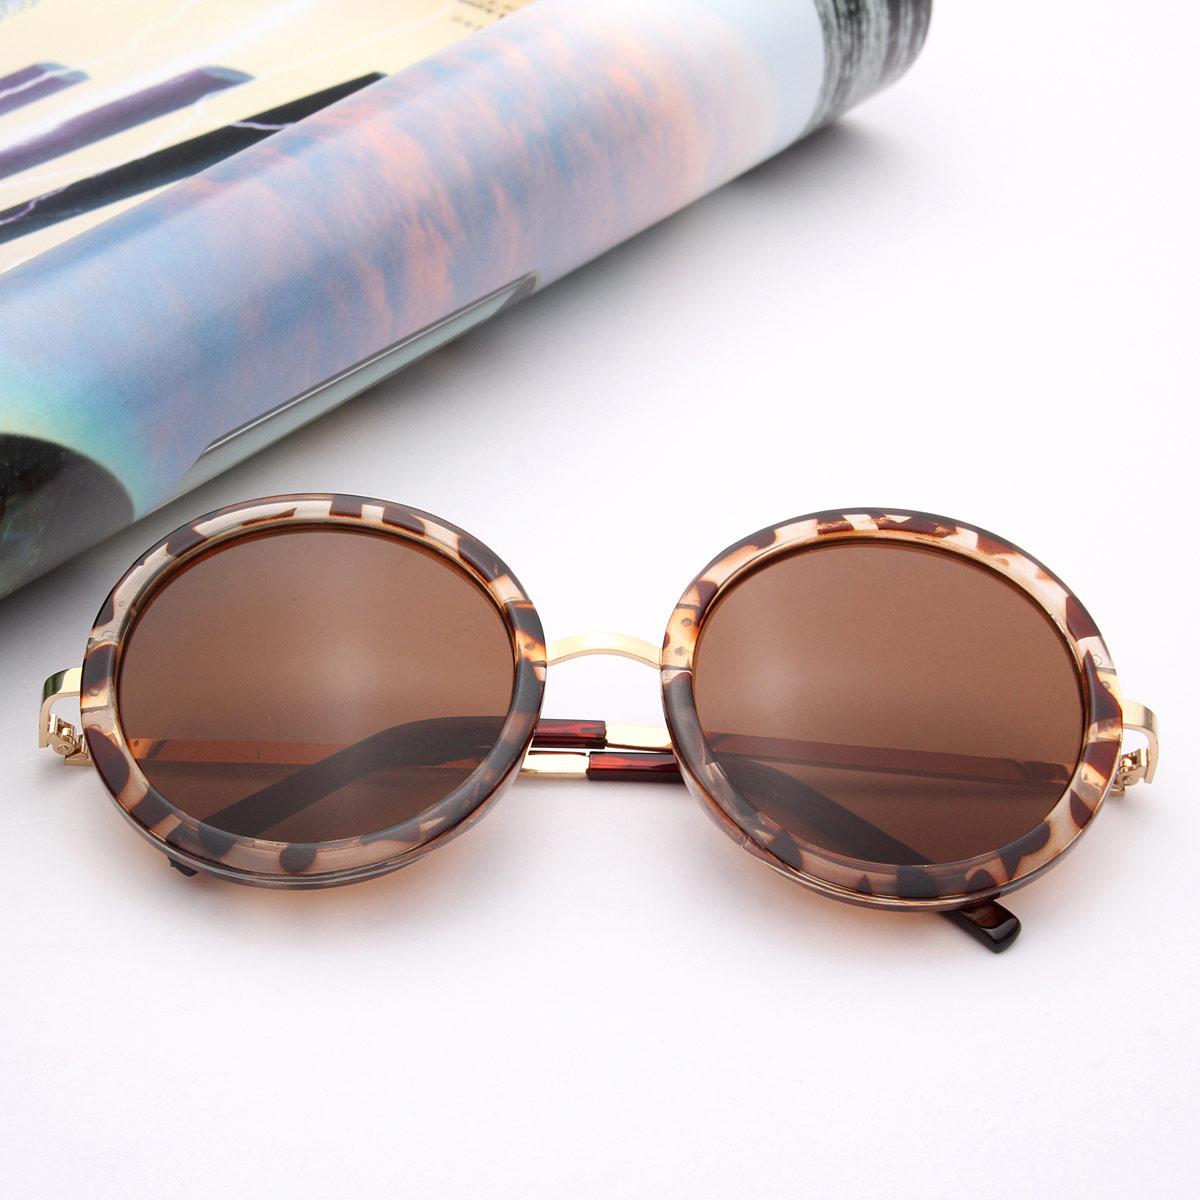 Round Frame Glasses Malaysia : Unisex Classic Round Frame Sunglasses Lazada Malaysia